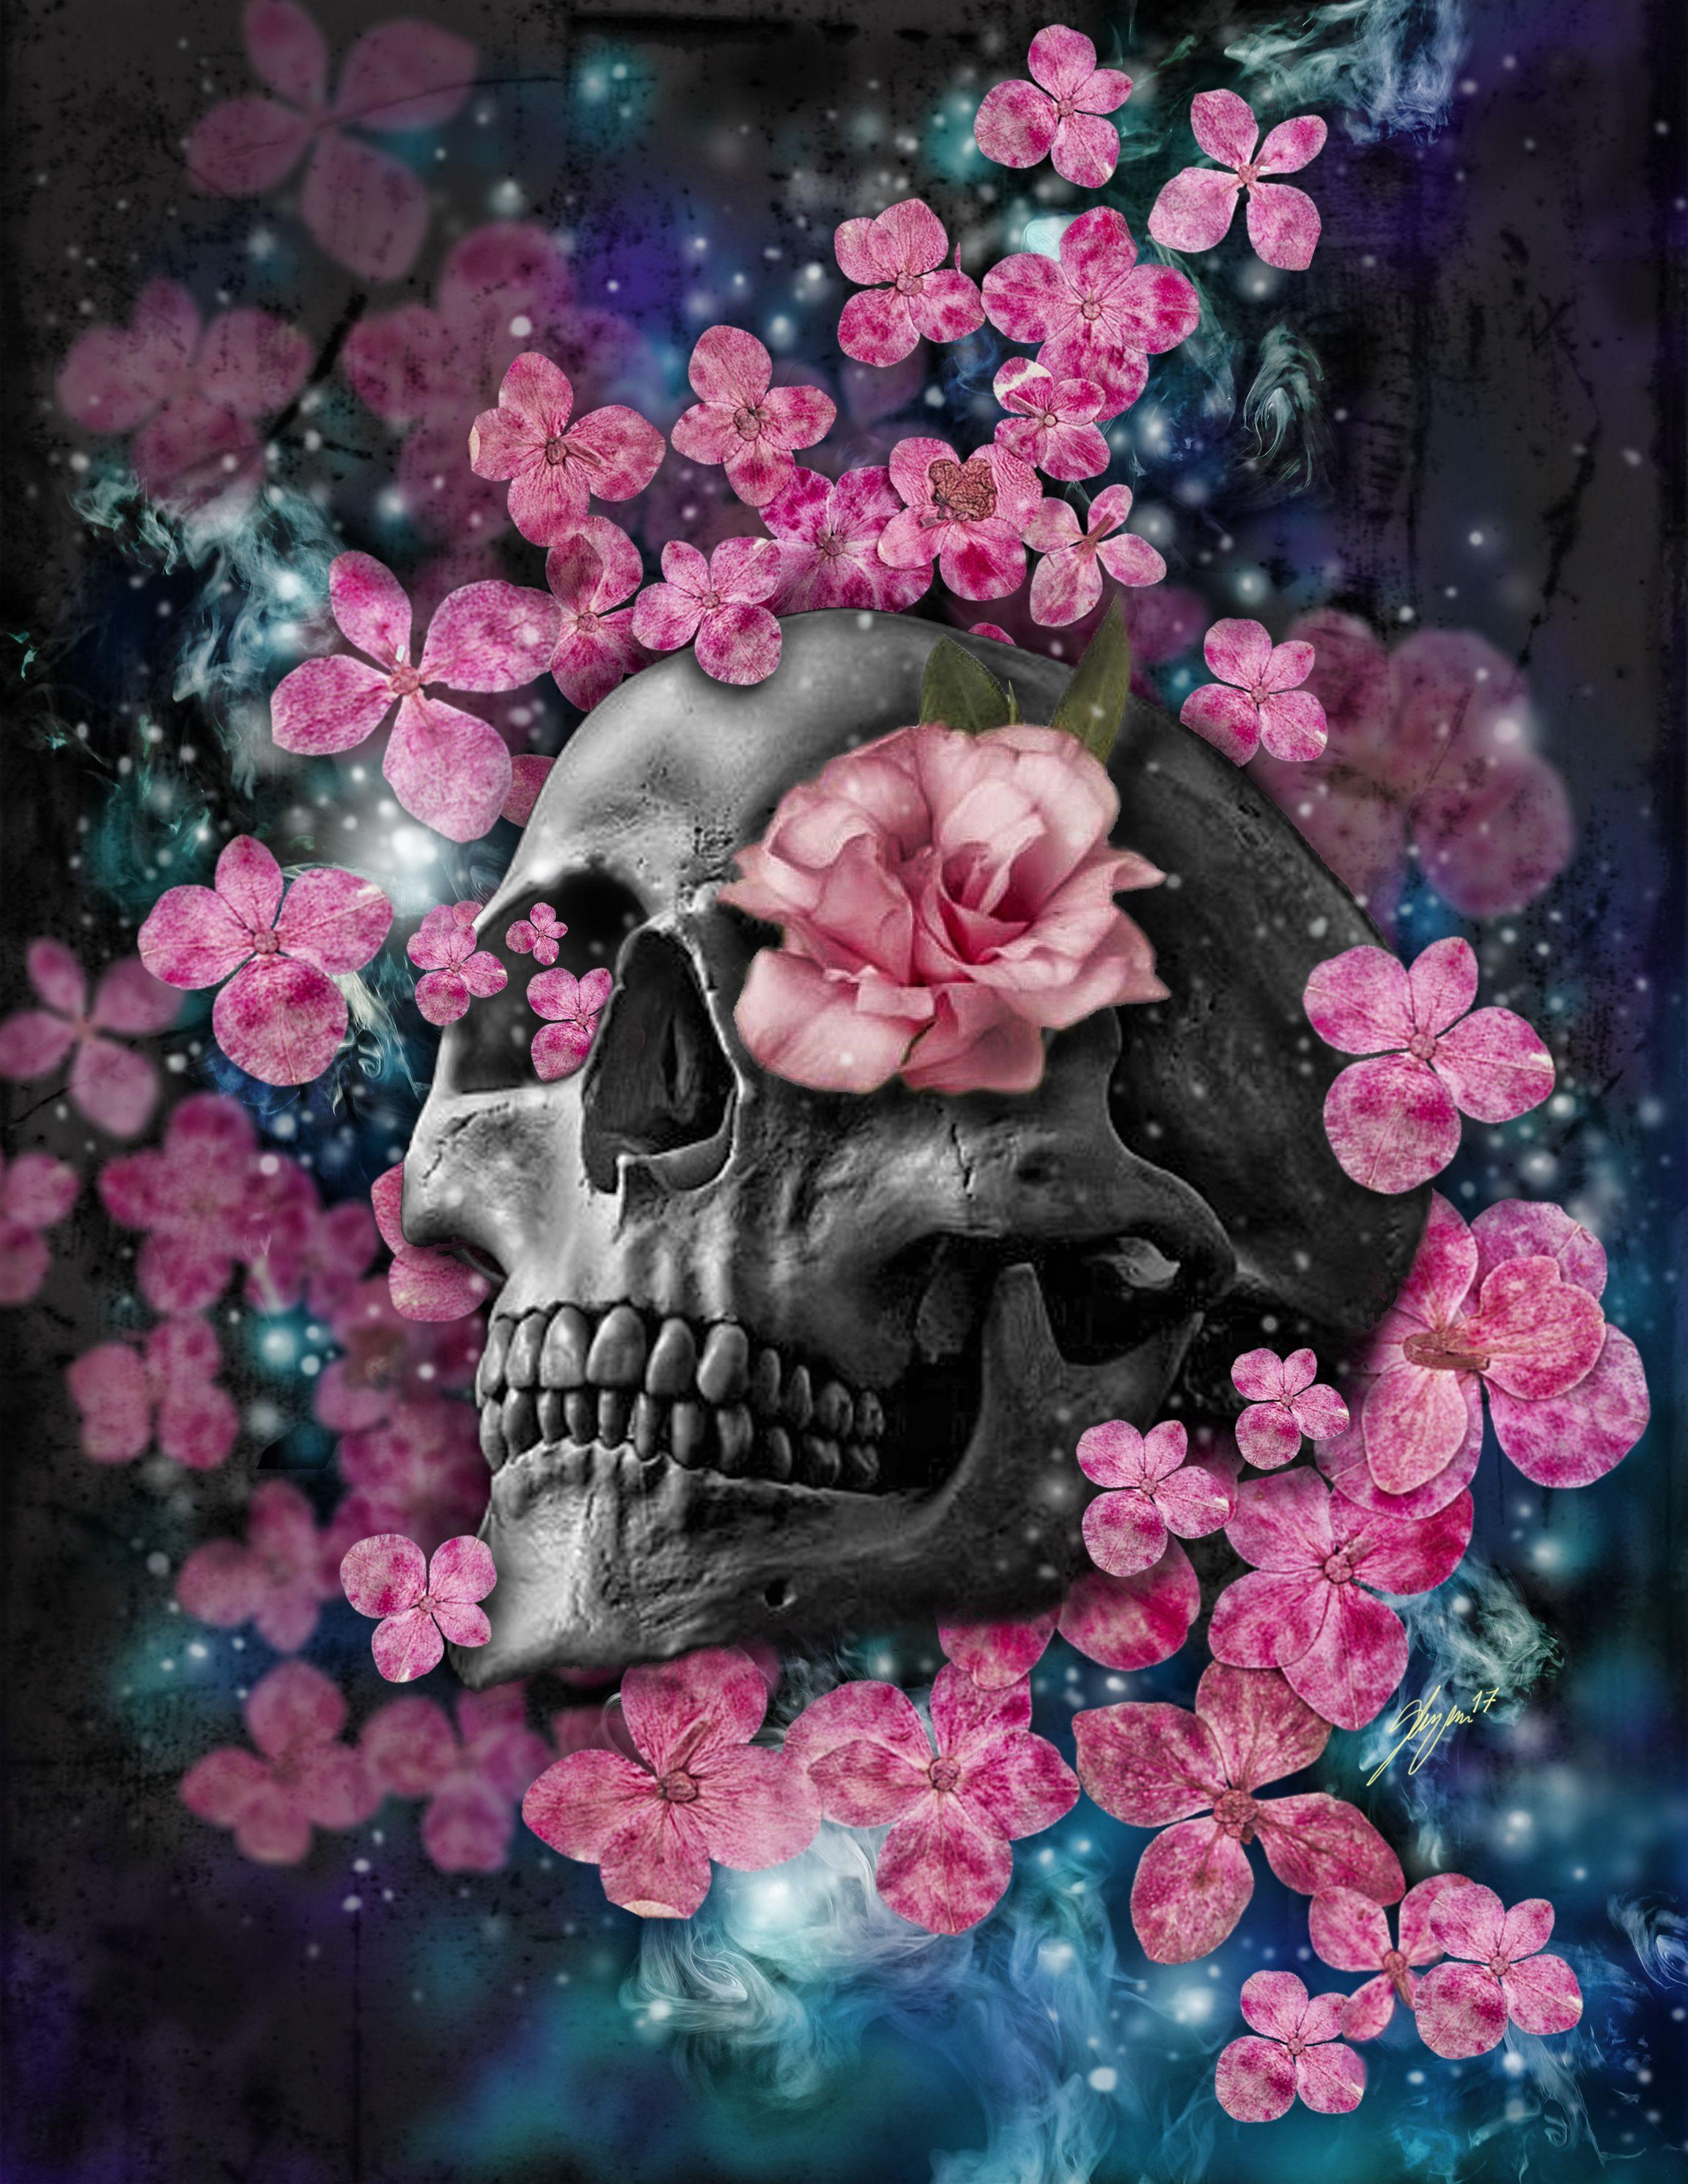 Skull Flowers Digitalart Skull Flowers Serglezama Skull